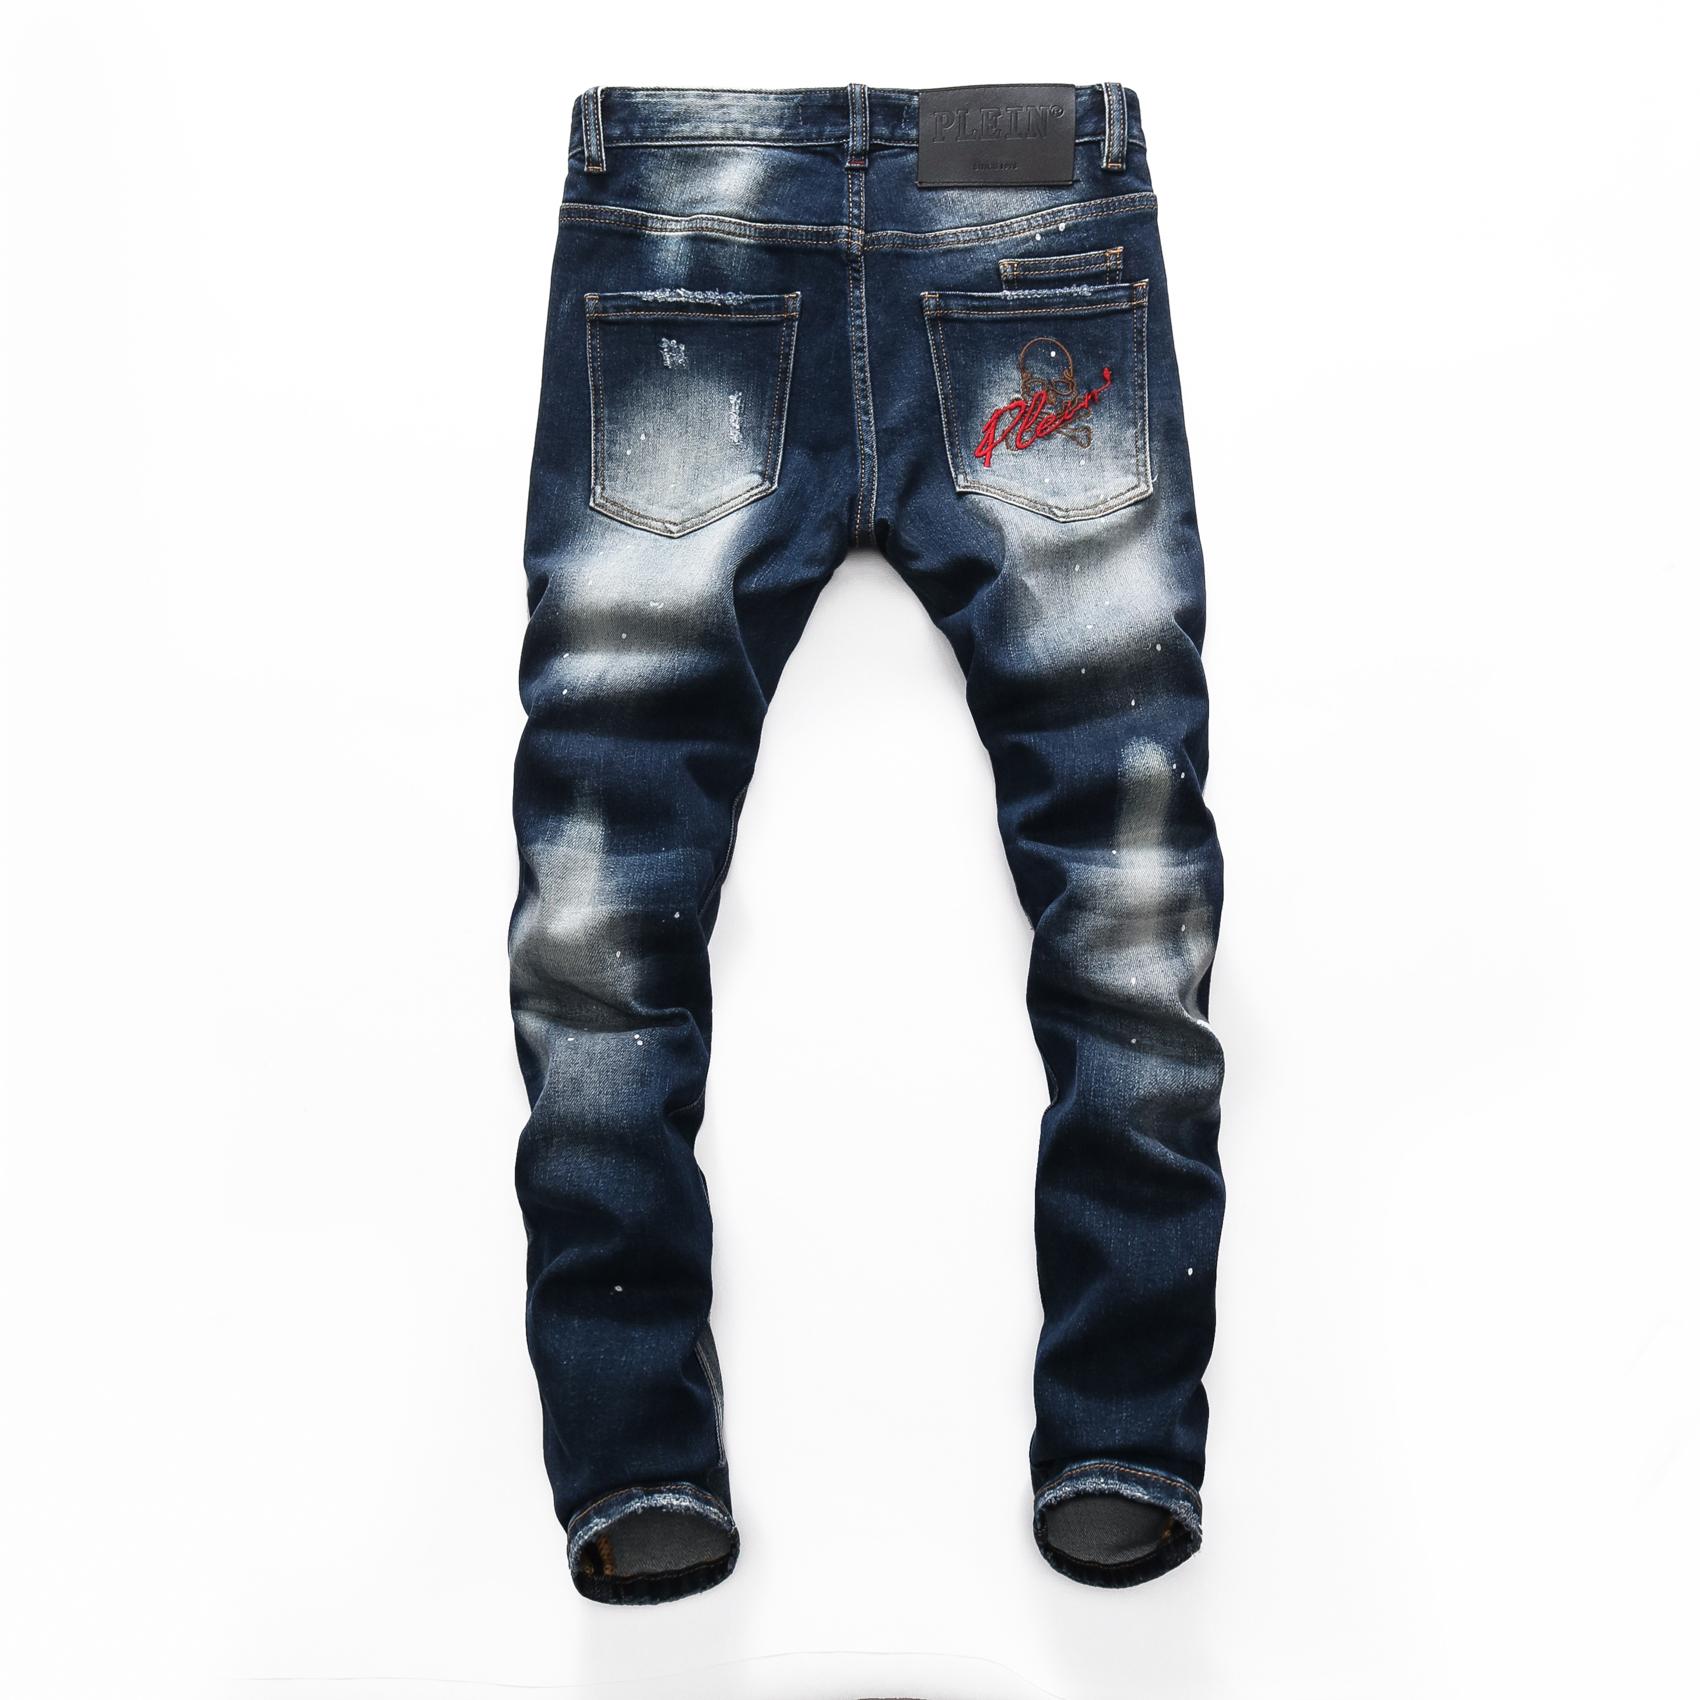 PINK PARADISE PLEIN Classic Fashion Man Jeans Rock Moto Mens Casual Design Ripped Jeans Distressed Skinny Denim Biker PLEIN Jeans 157491